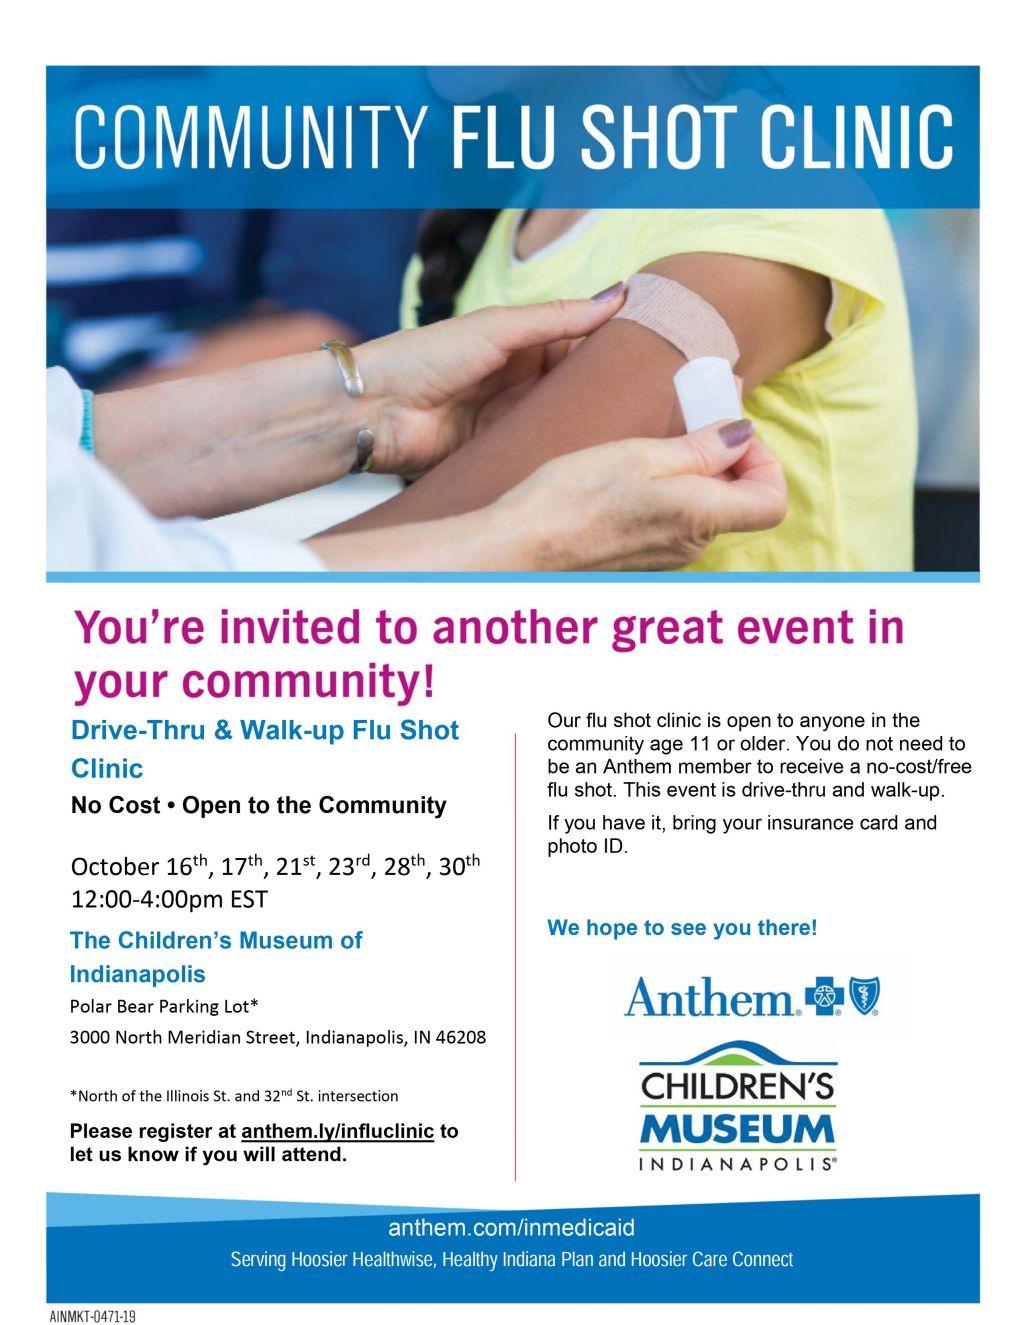 Anthem Community Flu Shot Clinic